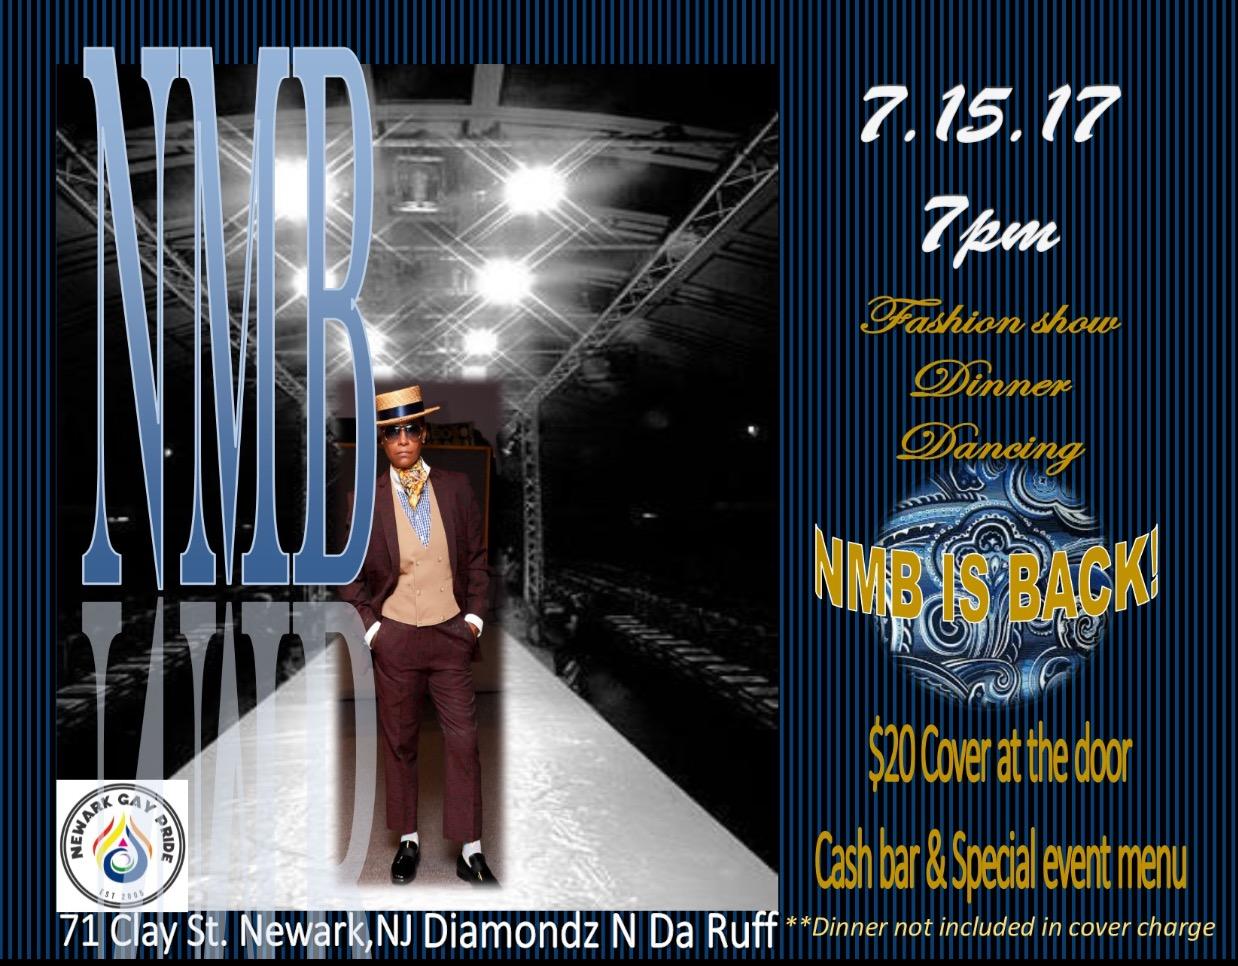 Saturday, July 15th - 7pm - 10pmNew Millennium ButchDiamondz-N-Da-Ruff Café & Lounge71 Clay Street, Newark, NJ